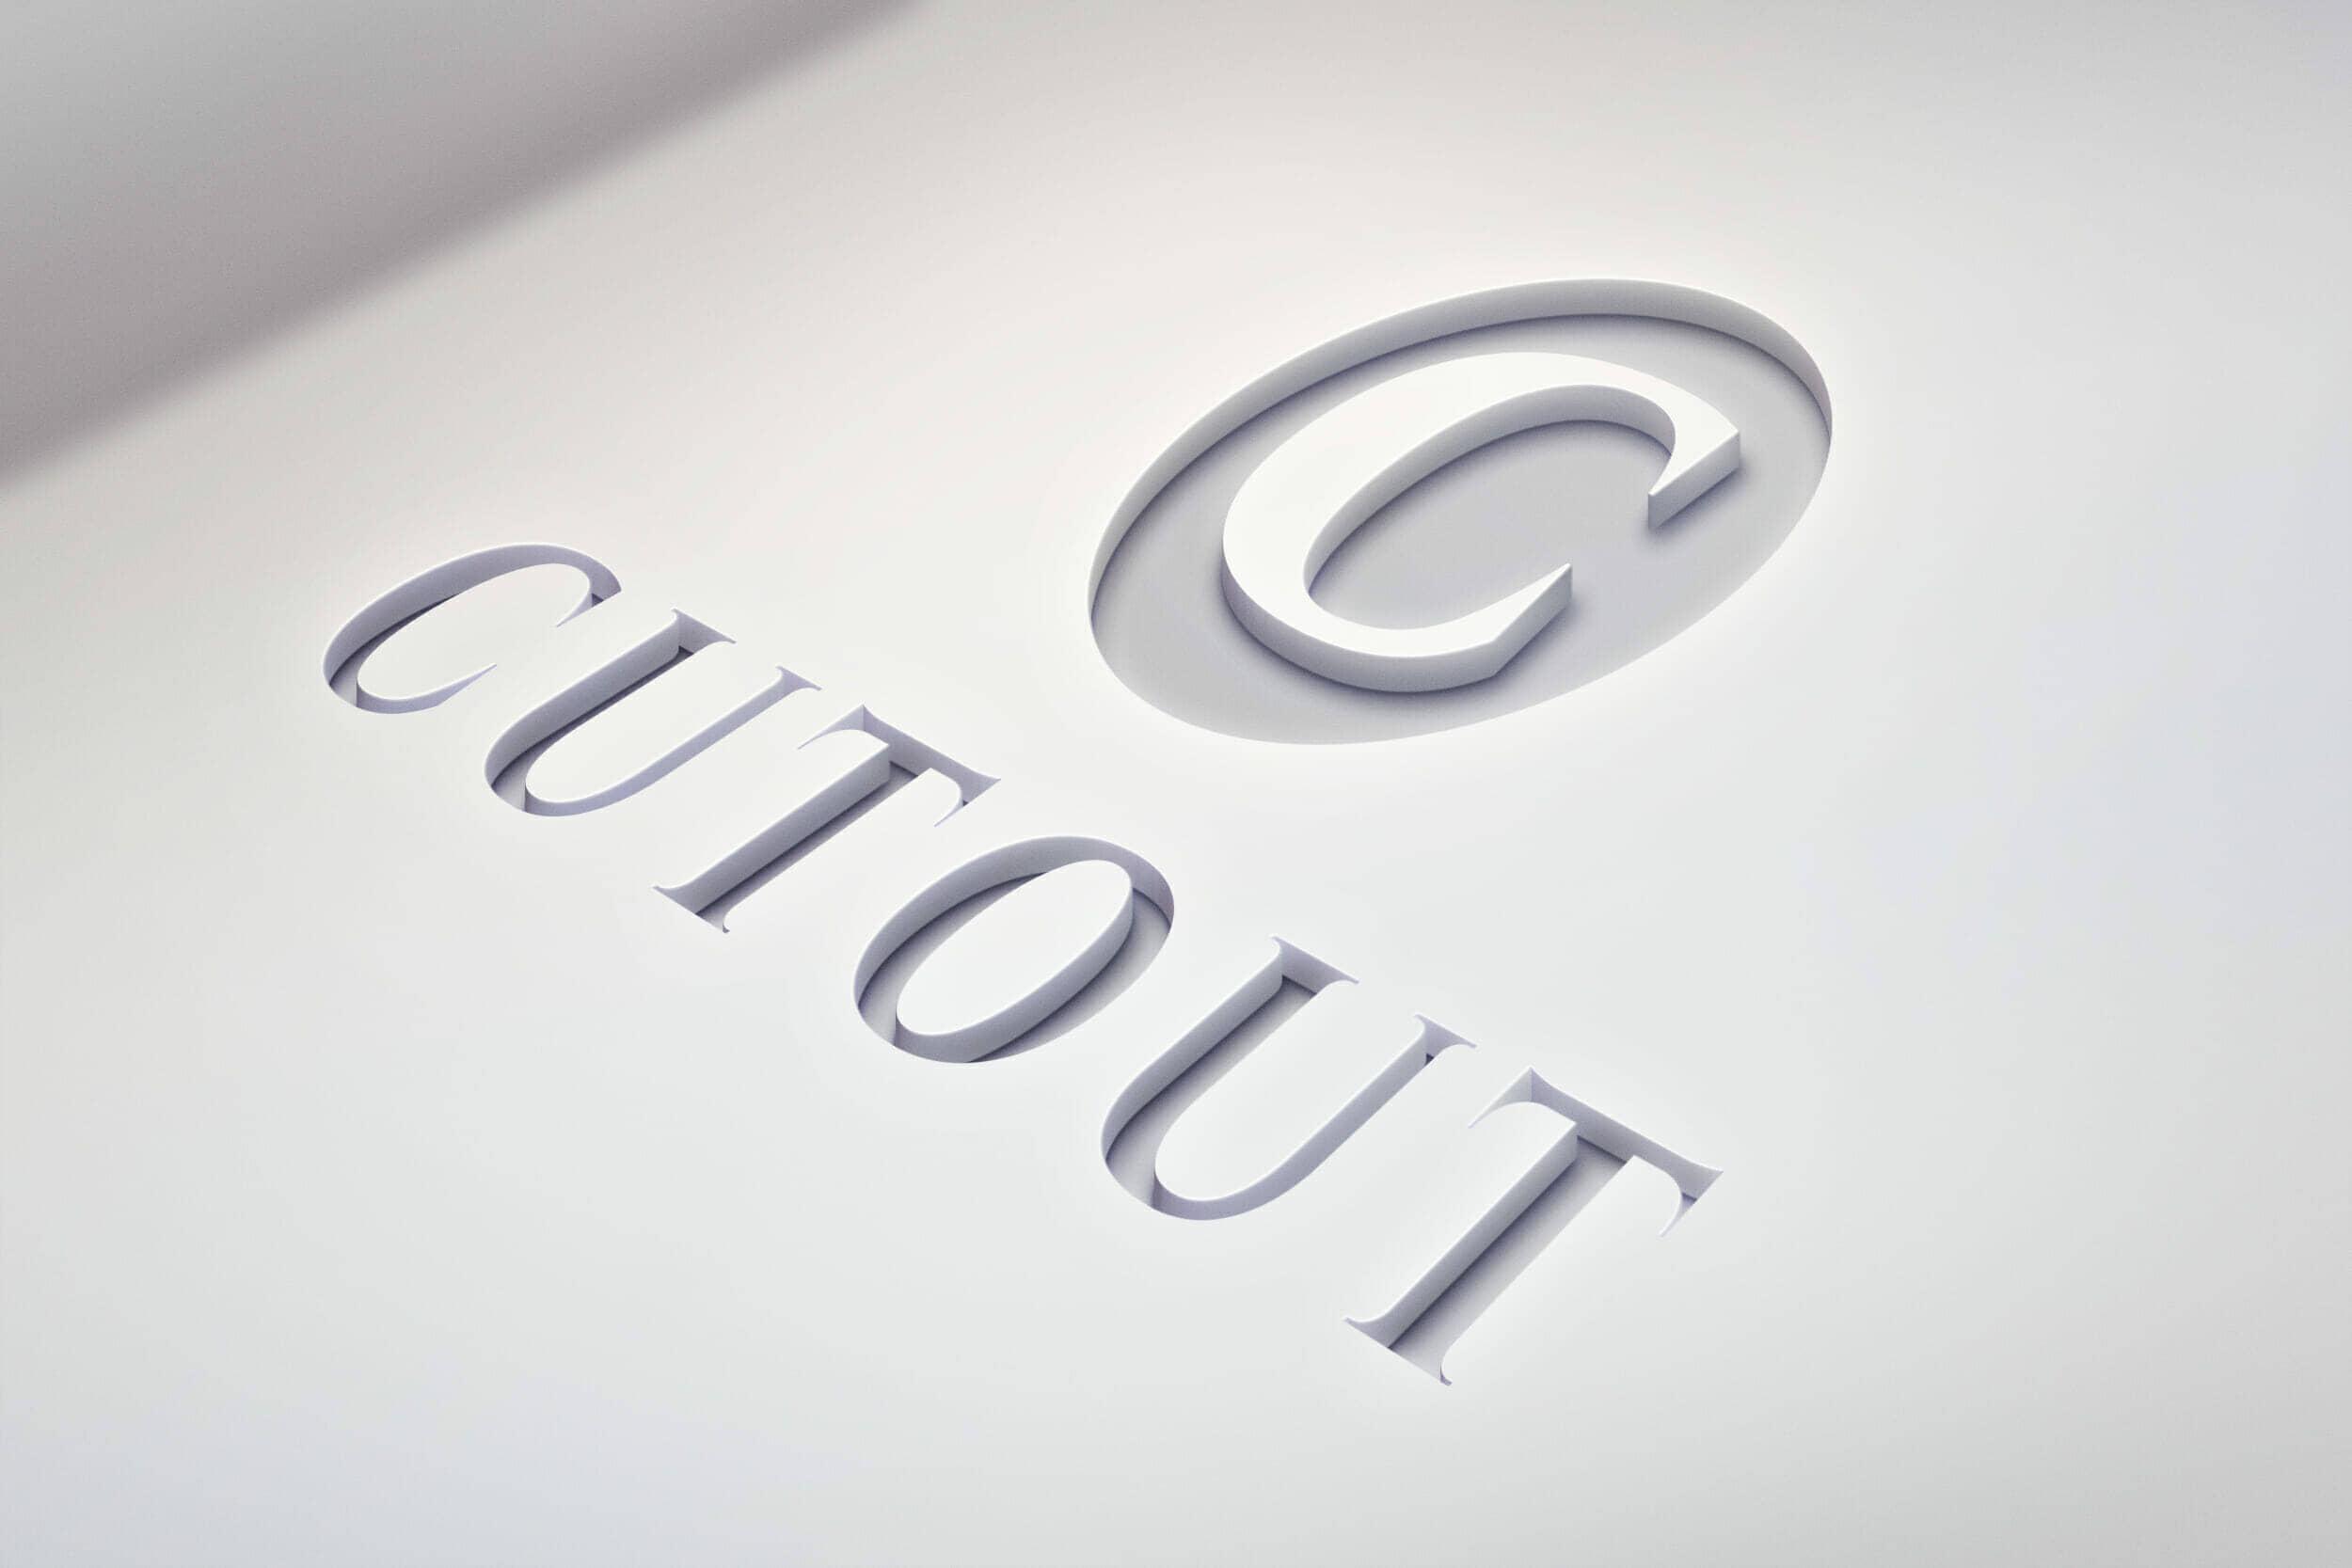 Clean White Logo Cutout Mockup